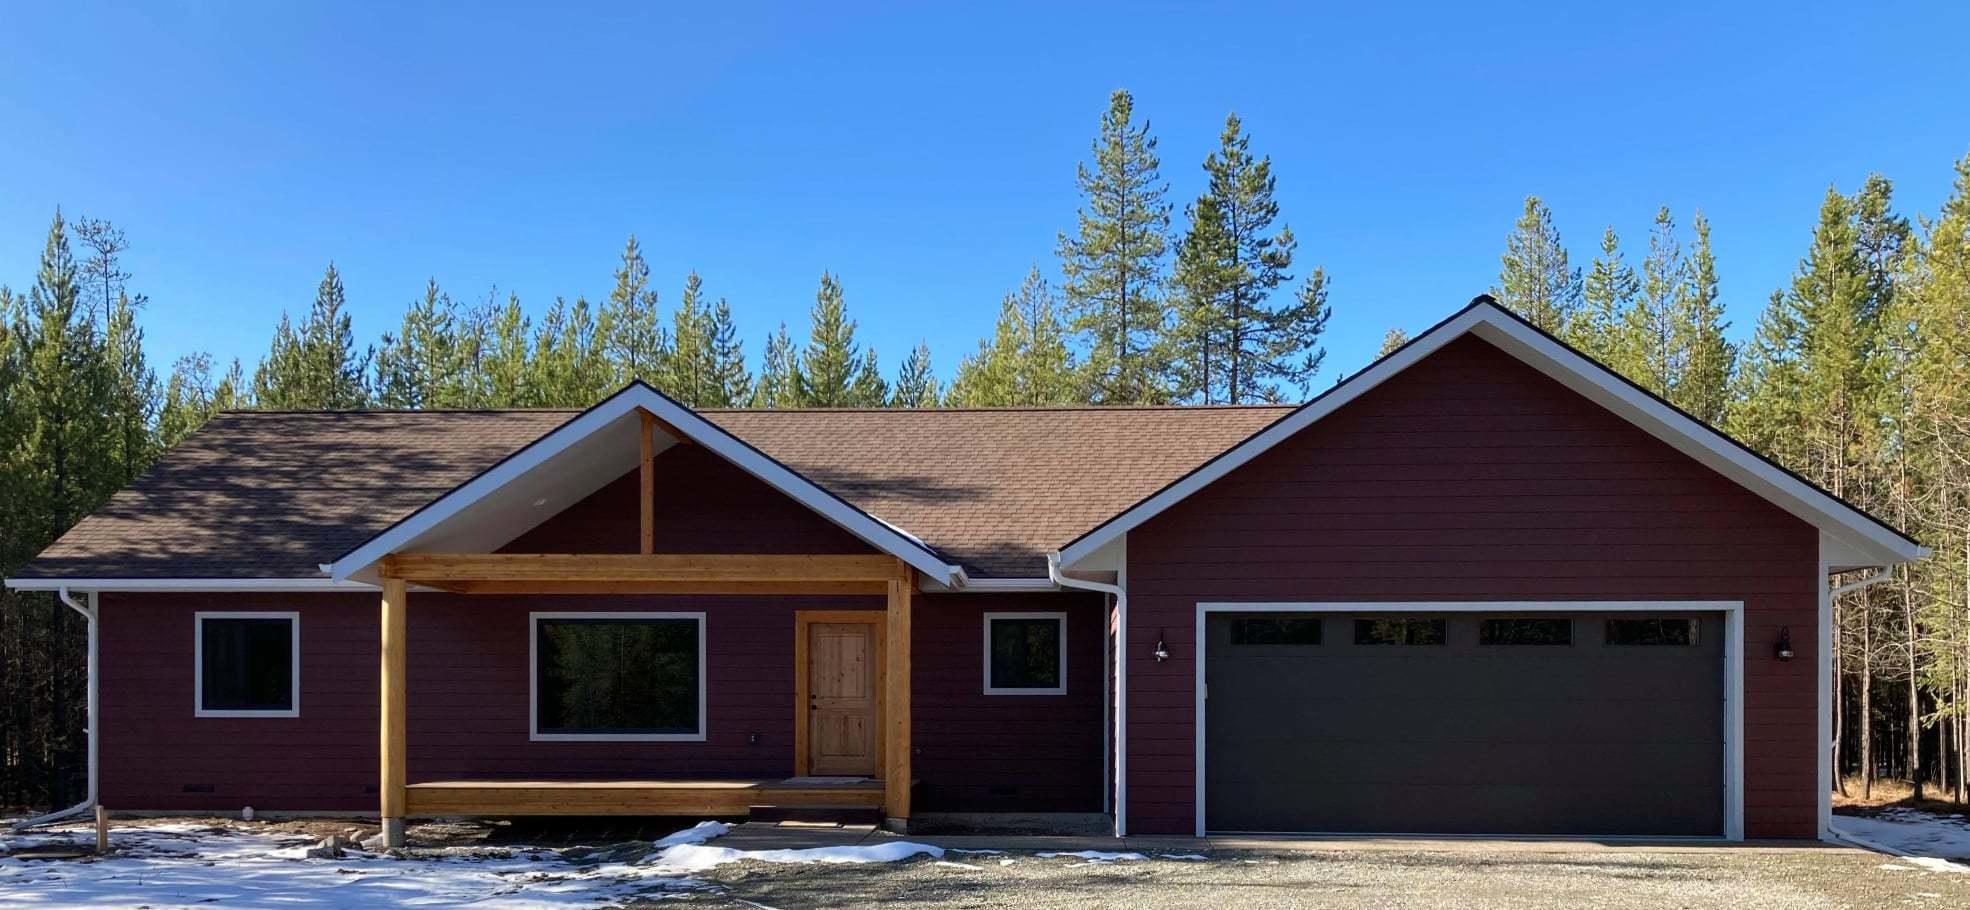 129 Bear Hollow Drive, Bigfork, MT 59911